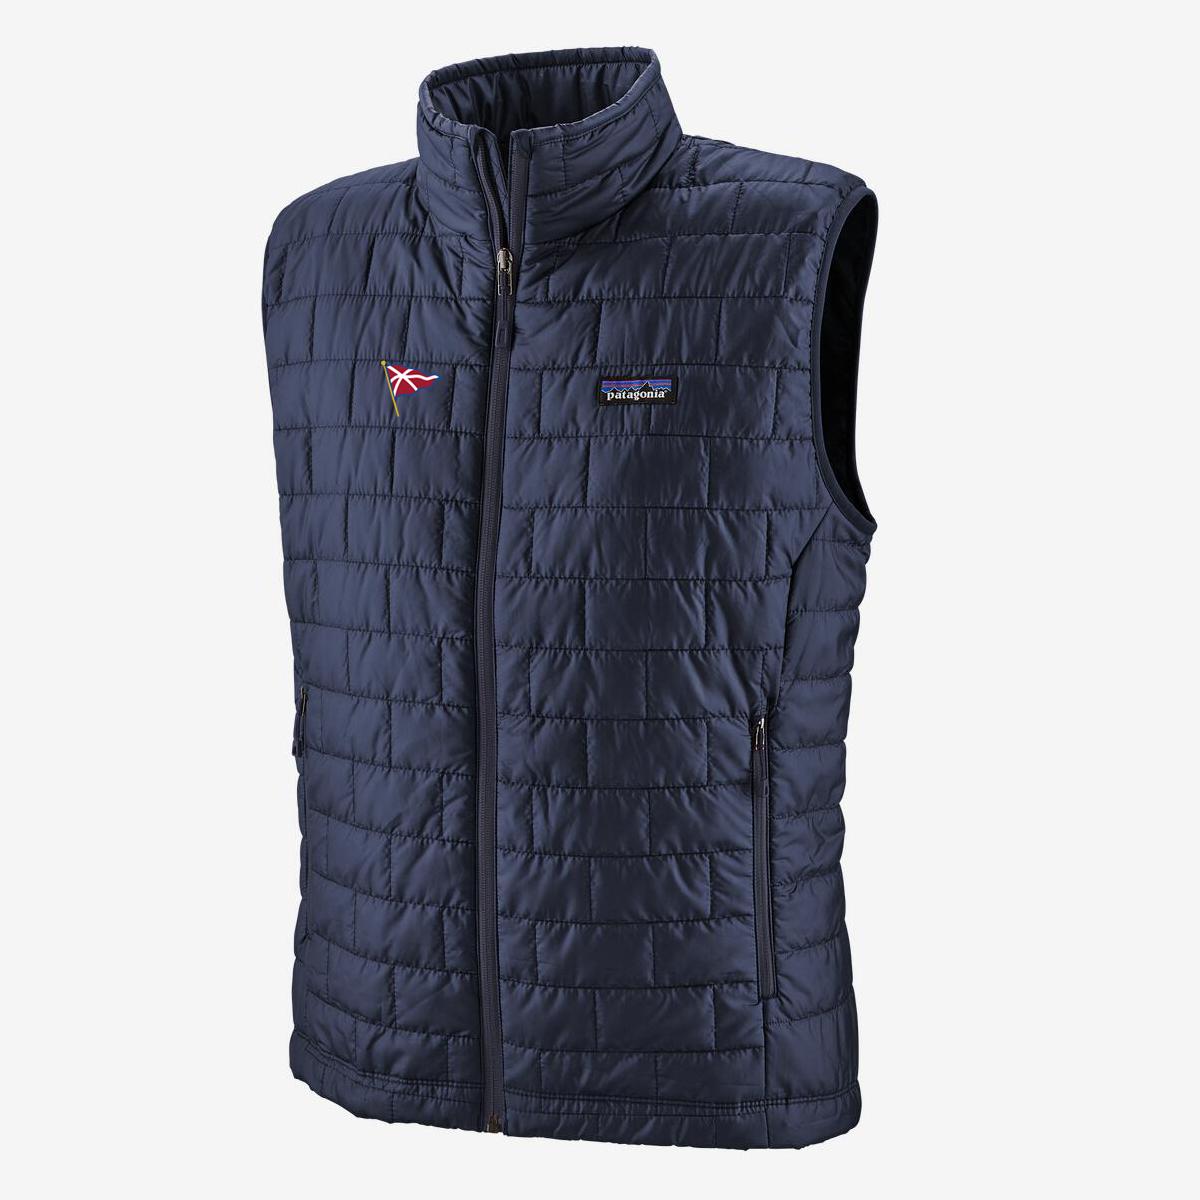 Orient Yacht Club - Patagonia Men's Nano Puff Vest